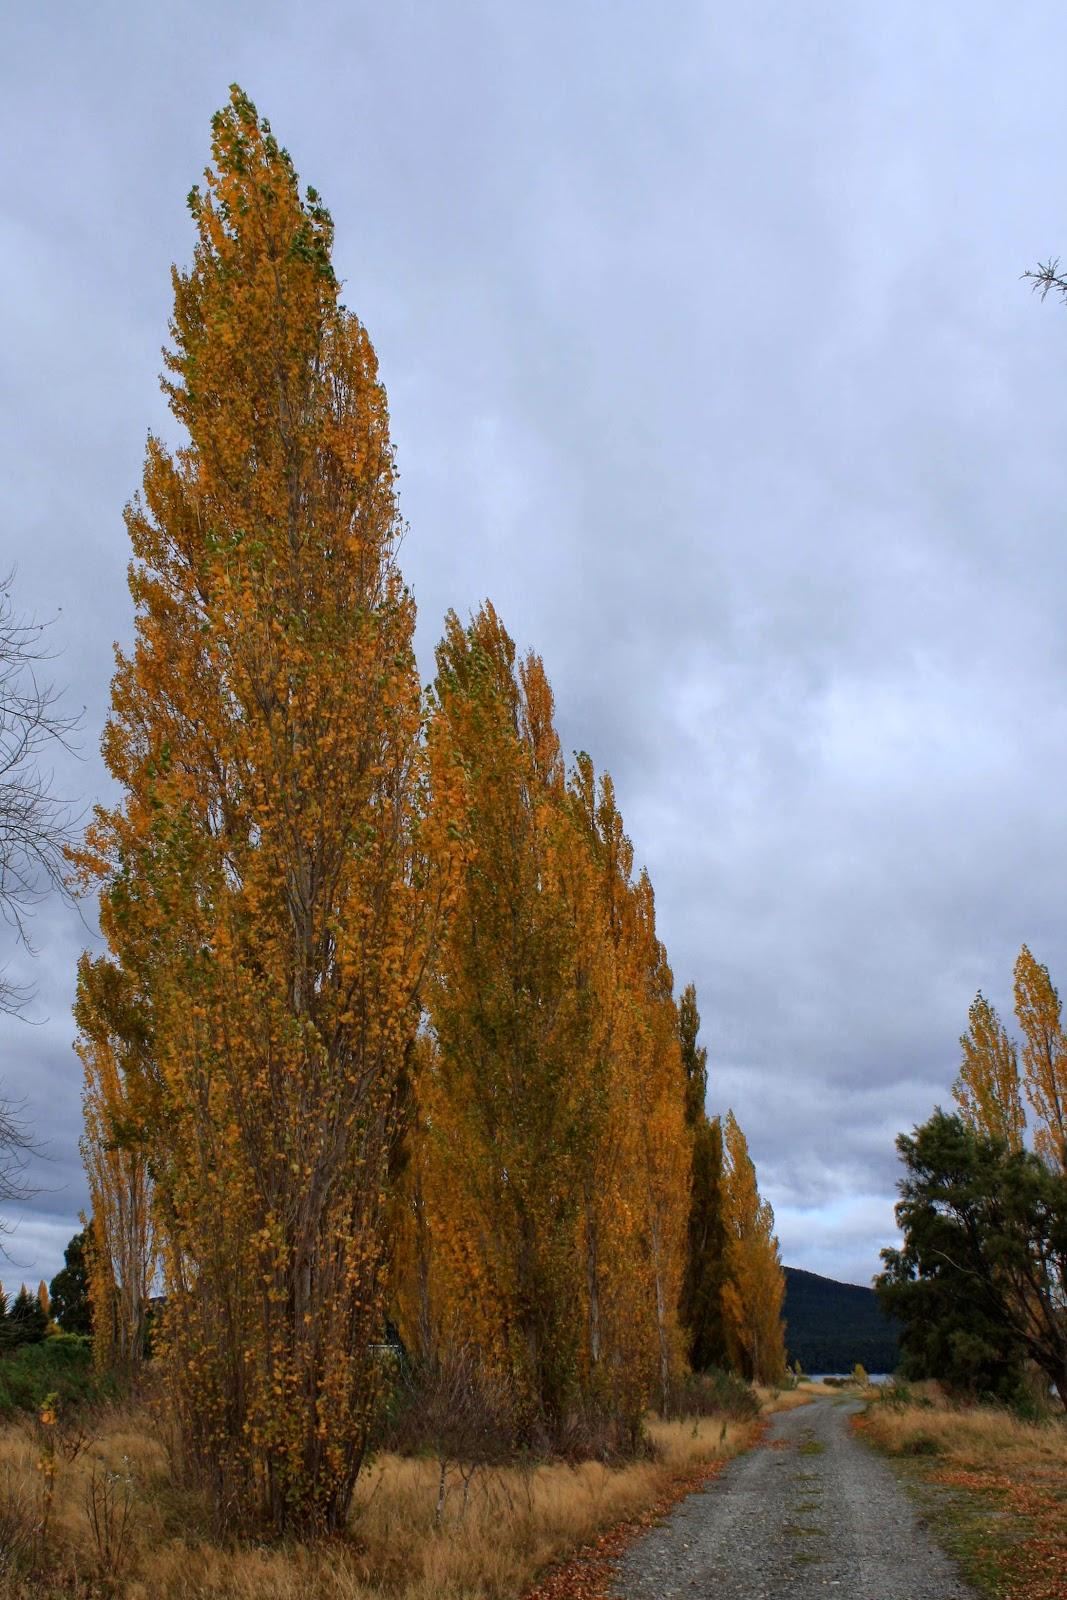 More orange trees.